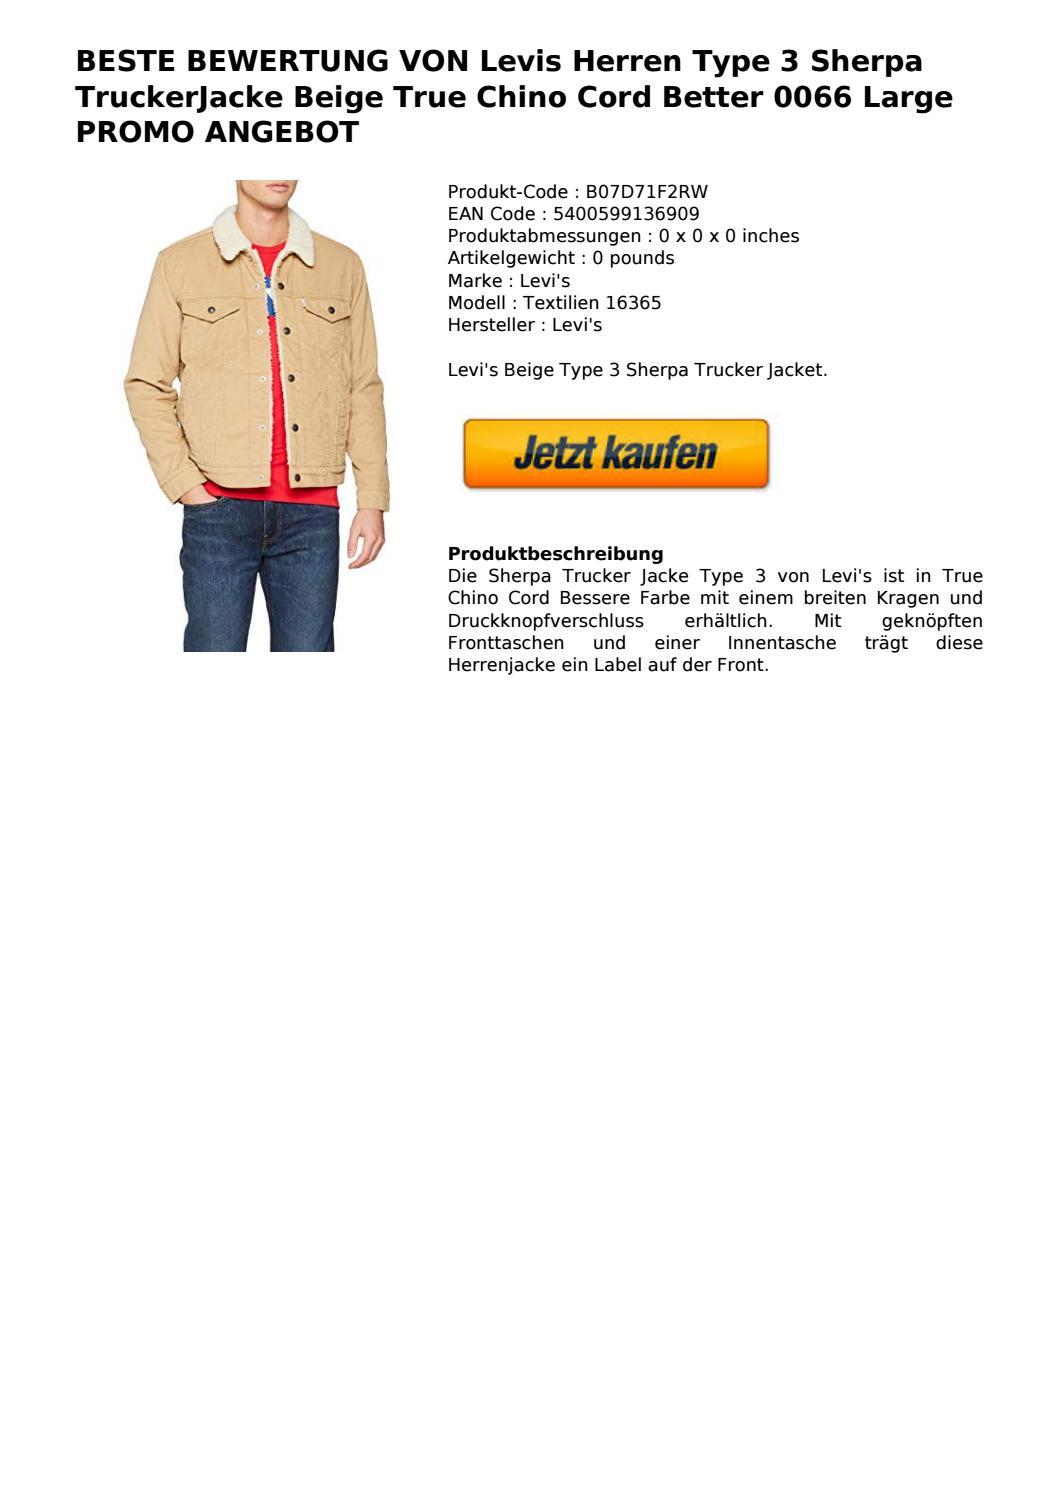 Details zu Levi's Herren Winter Jacke Type 3 Sherpa Parka Trucker True Chino Cord (beige)